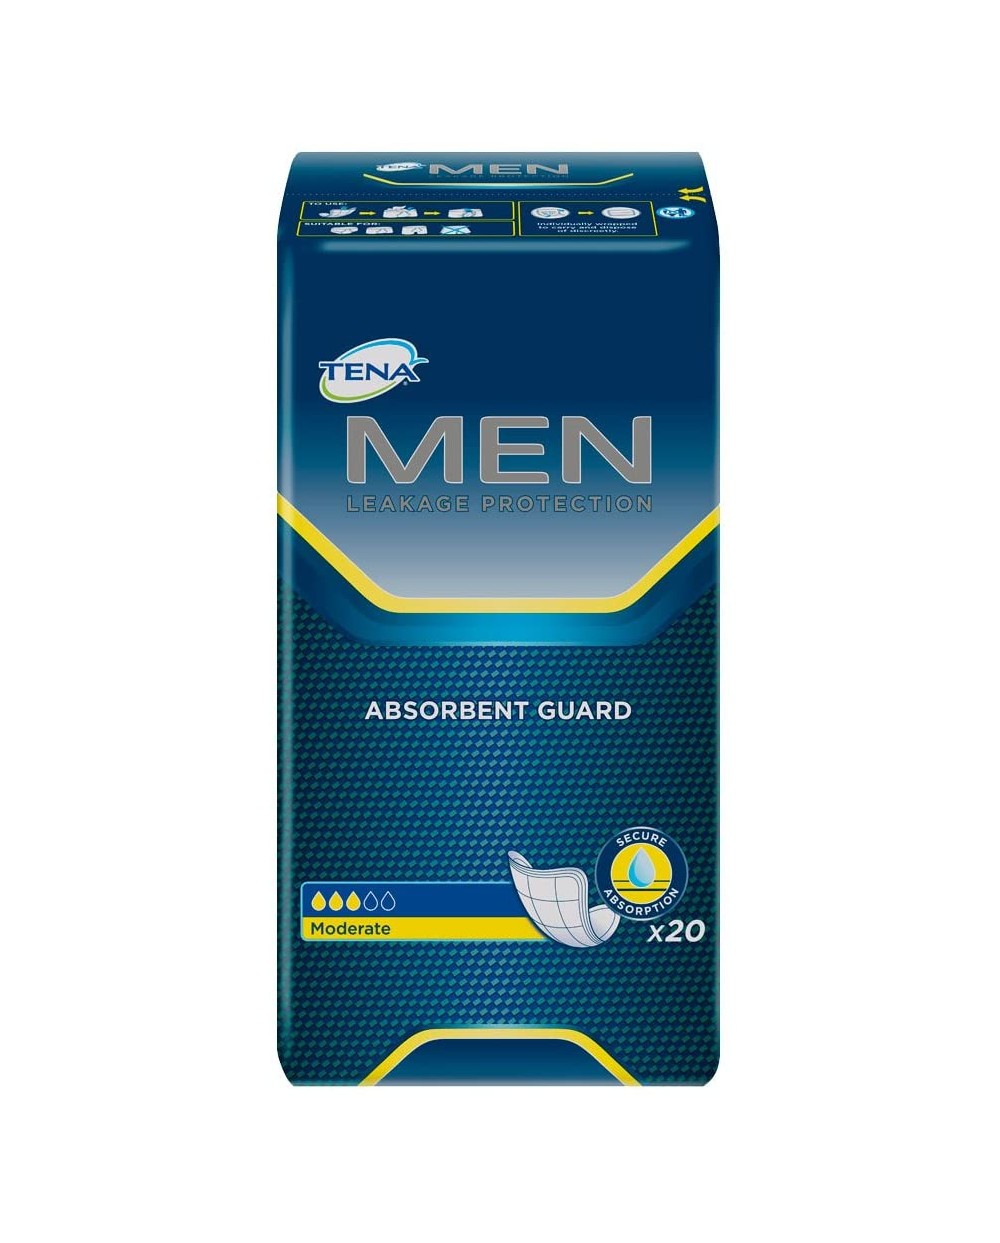 Tena Men Level 2  - 20 protections